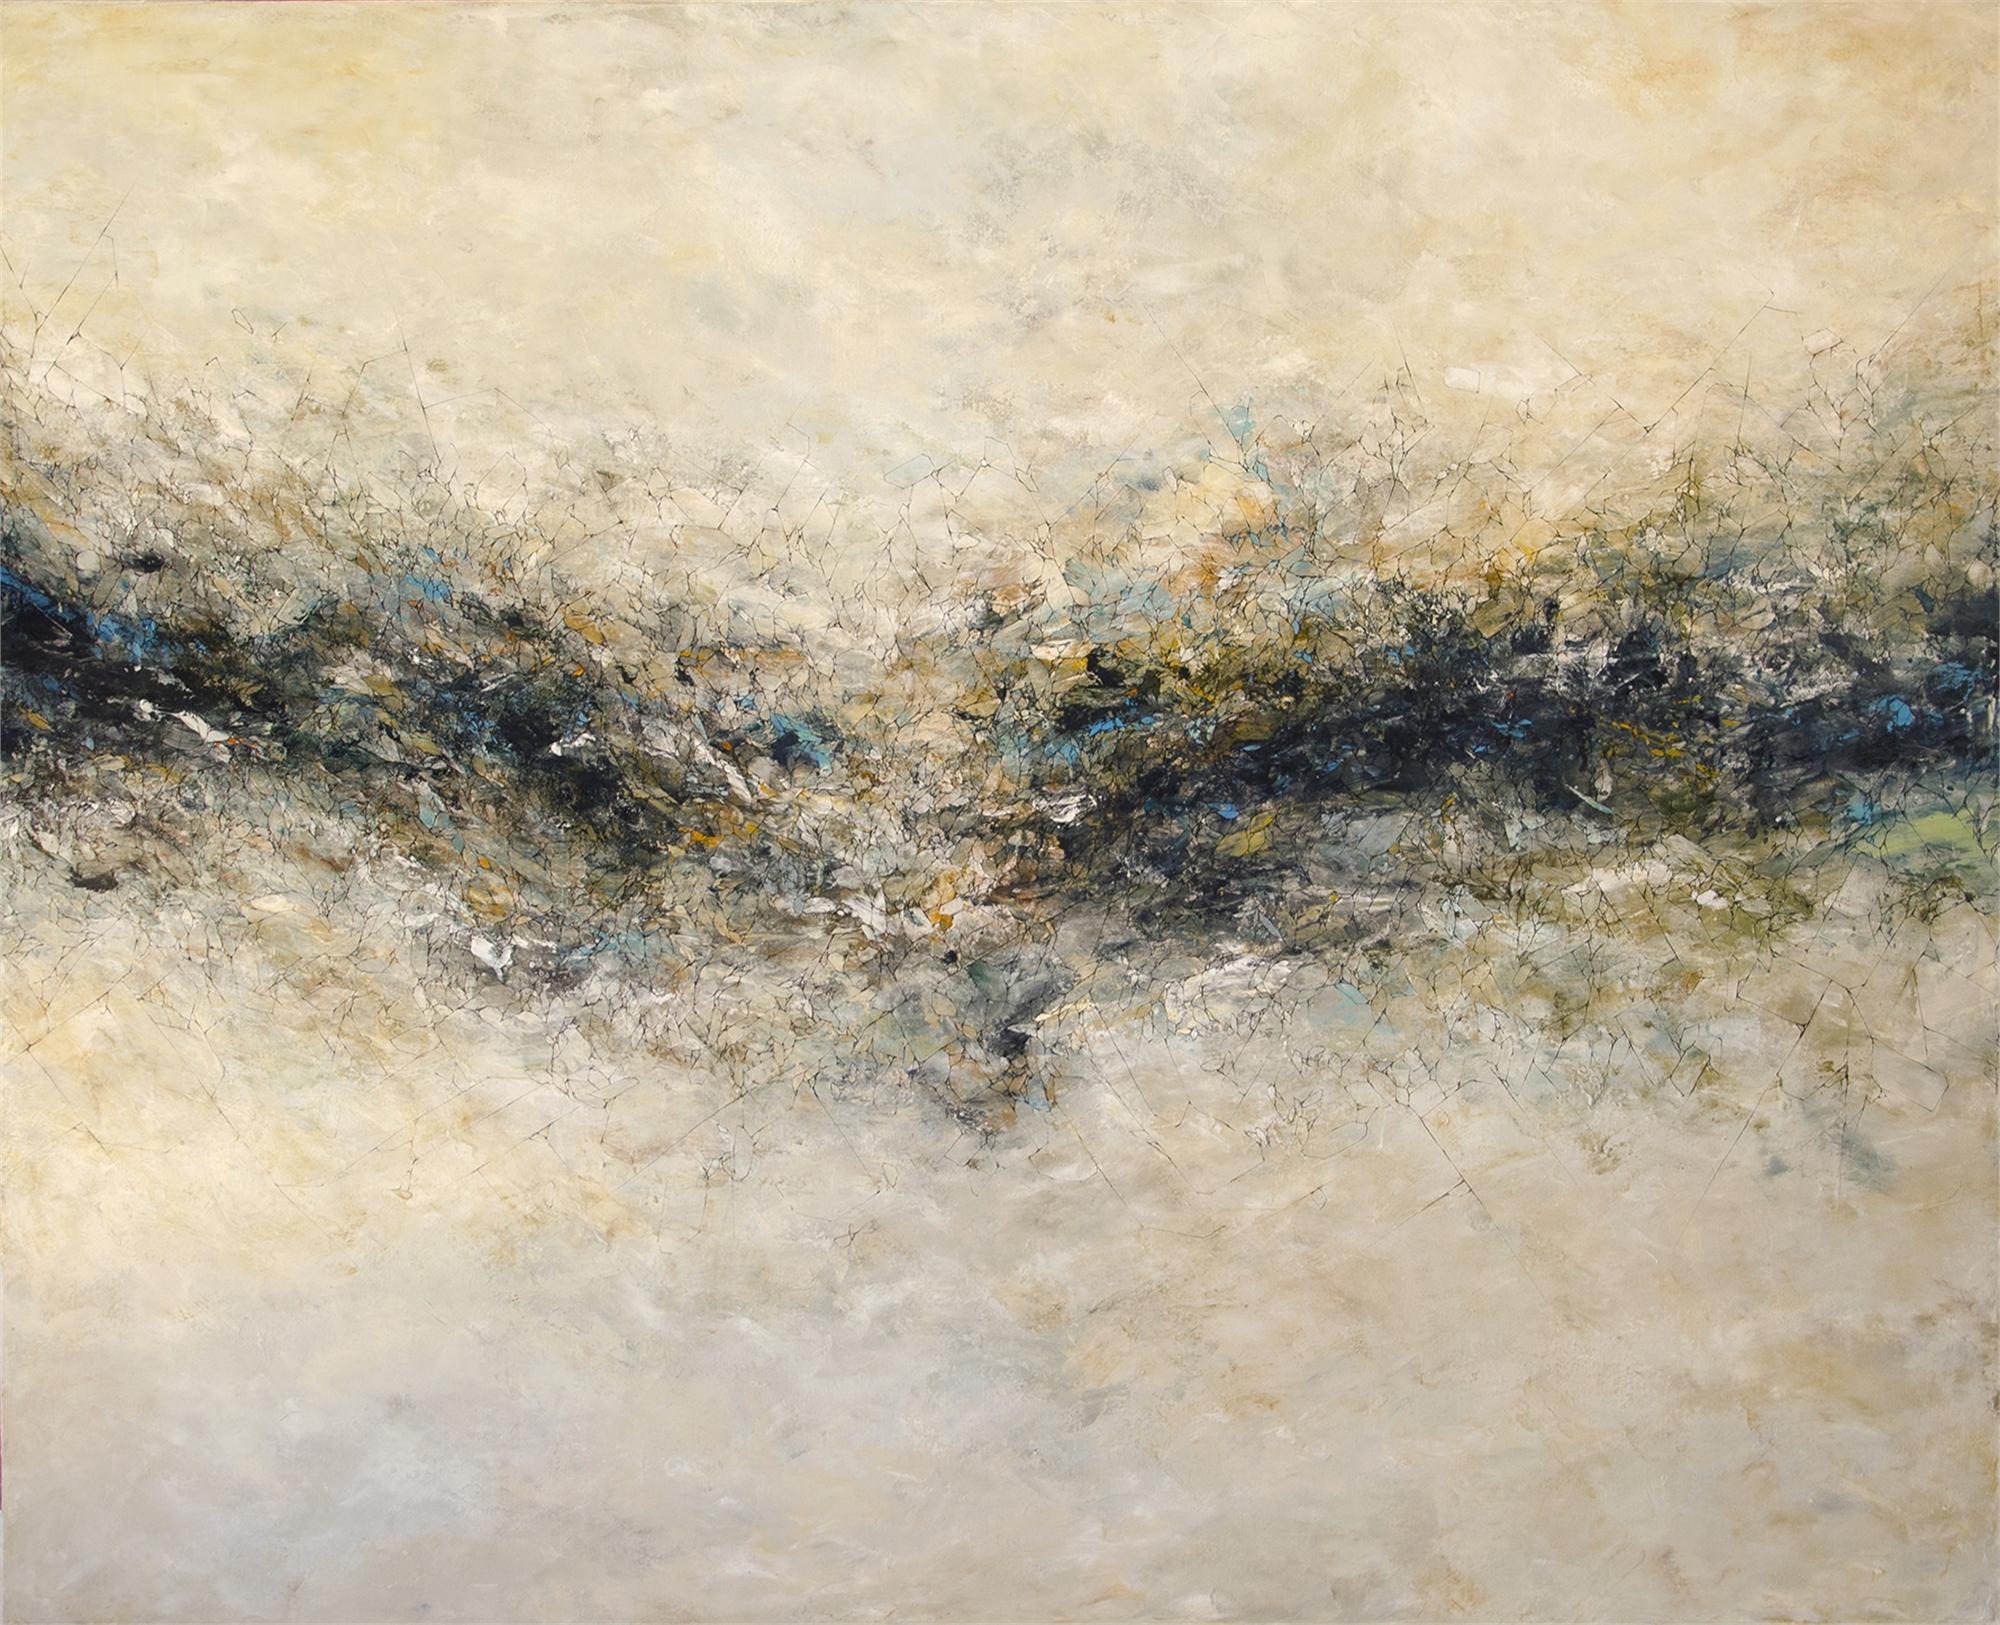 Inclination 2 by Aiden Kringen